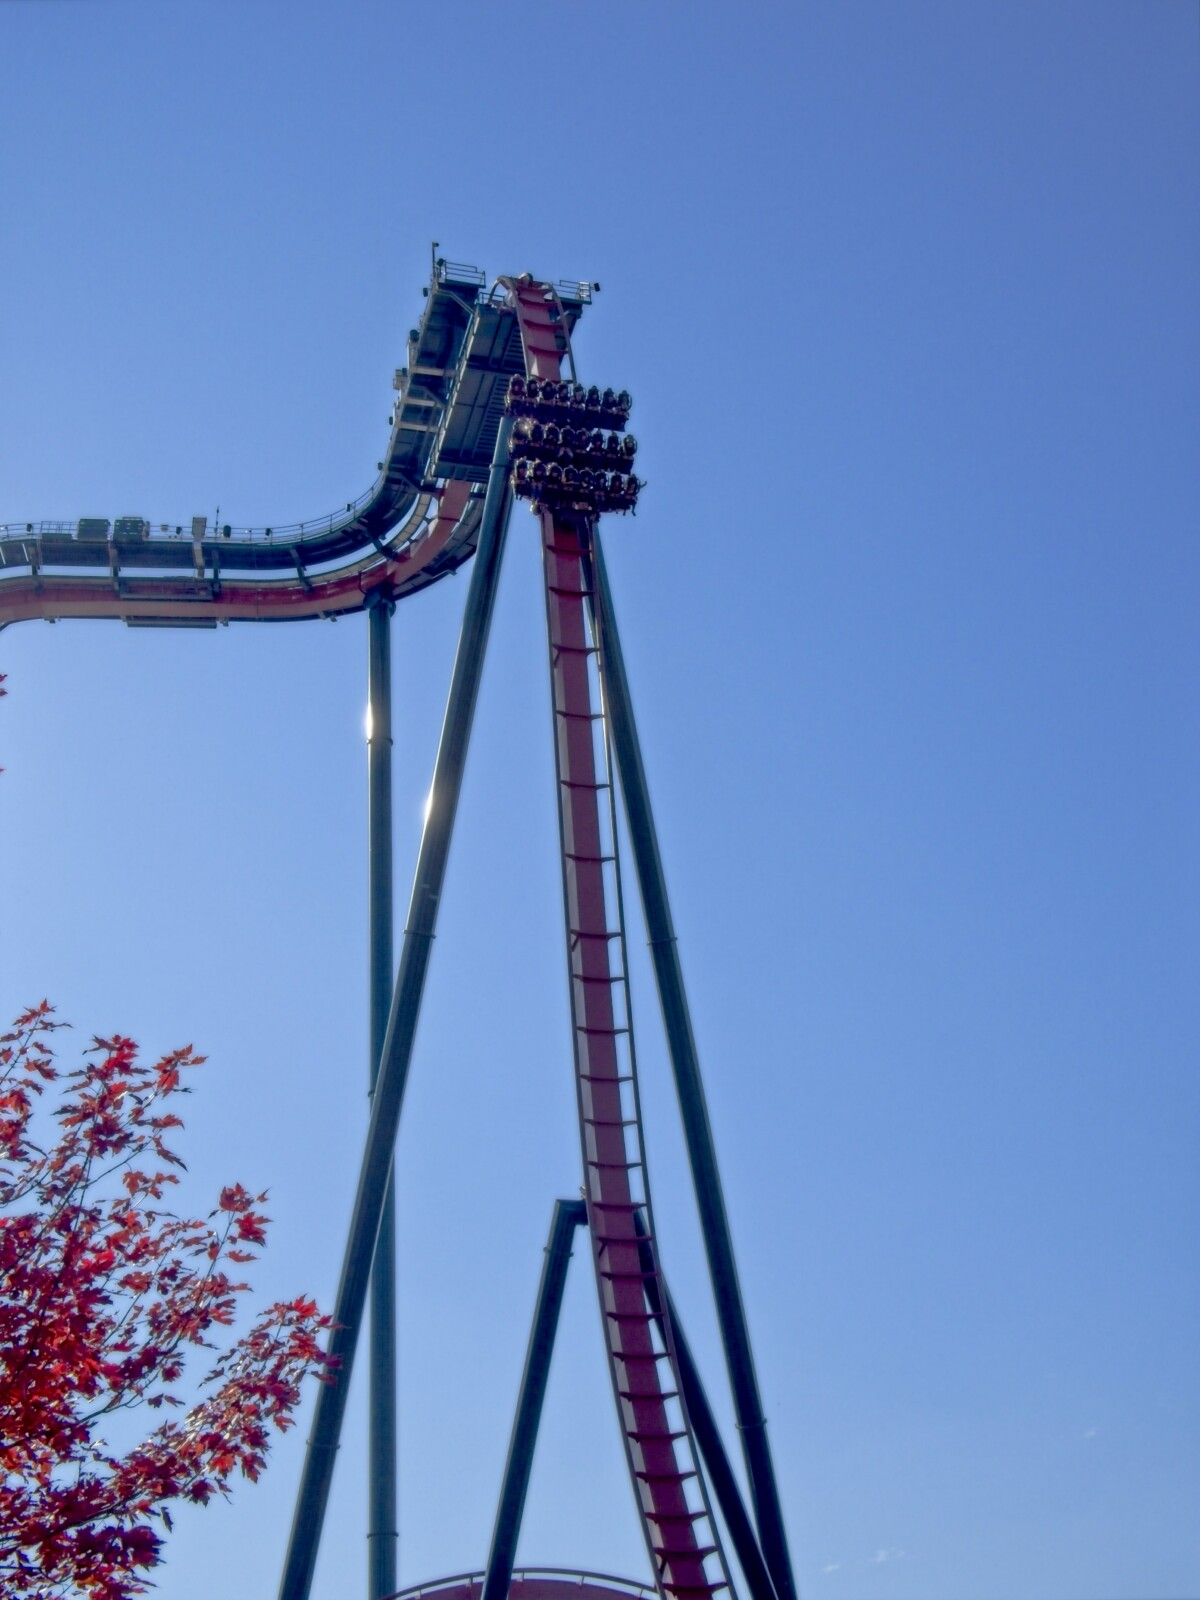 Yukon Striker Roller Coaster